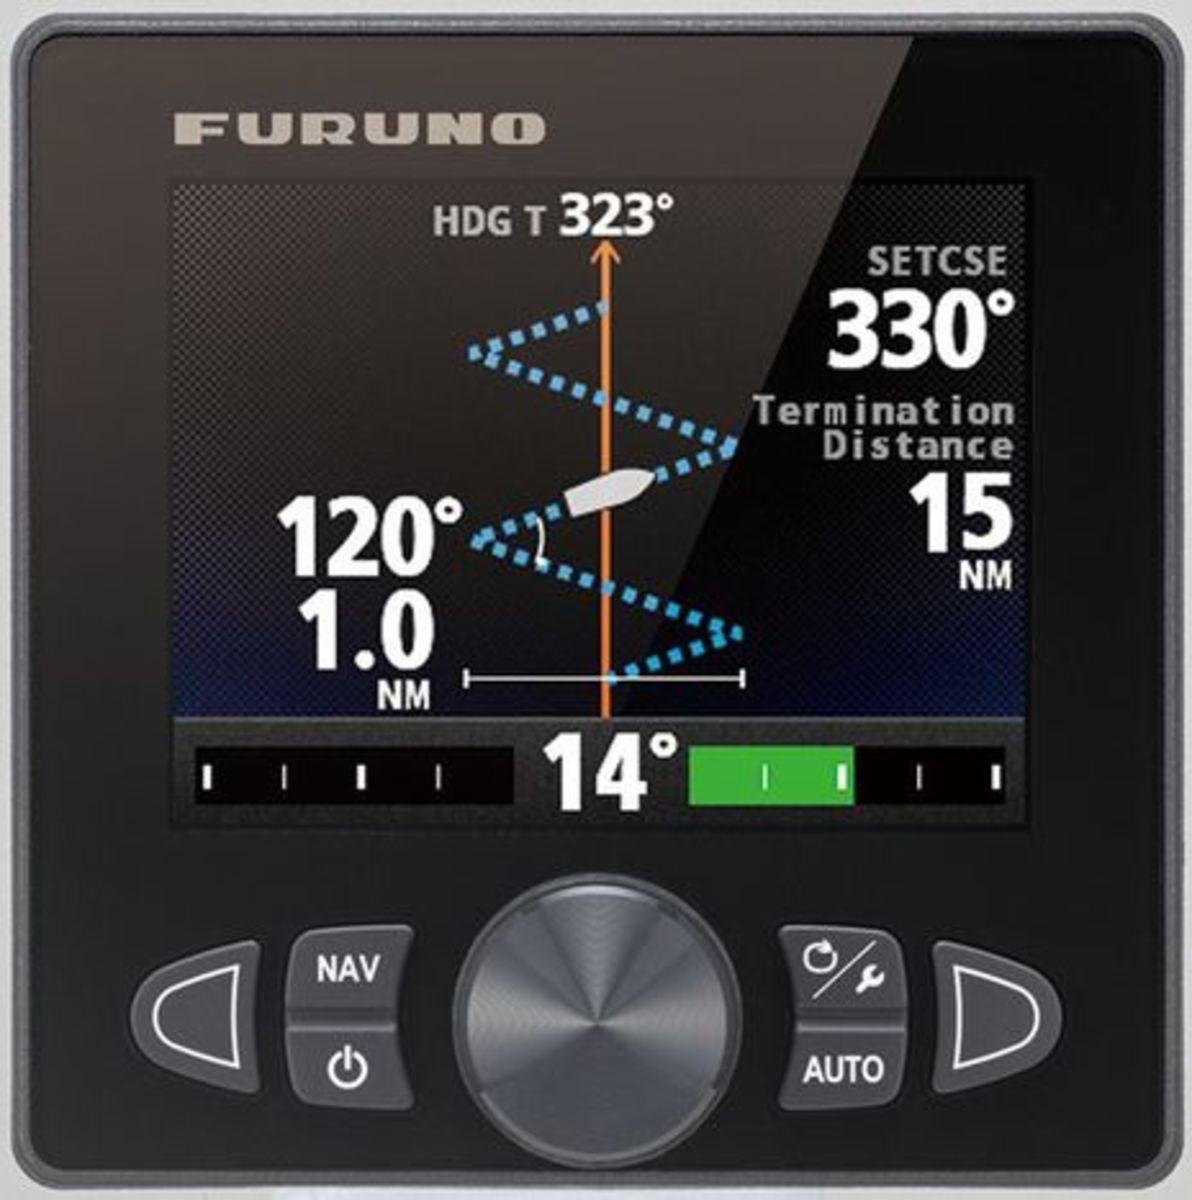 Furuno_711c_autopilot_head_aPanbo.jpg